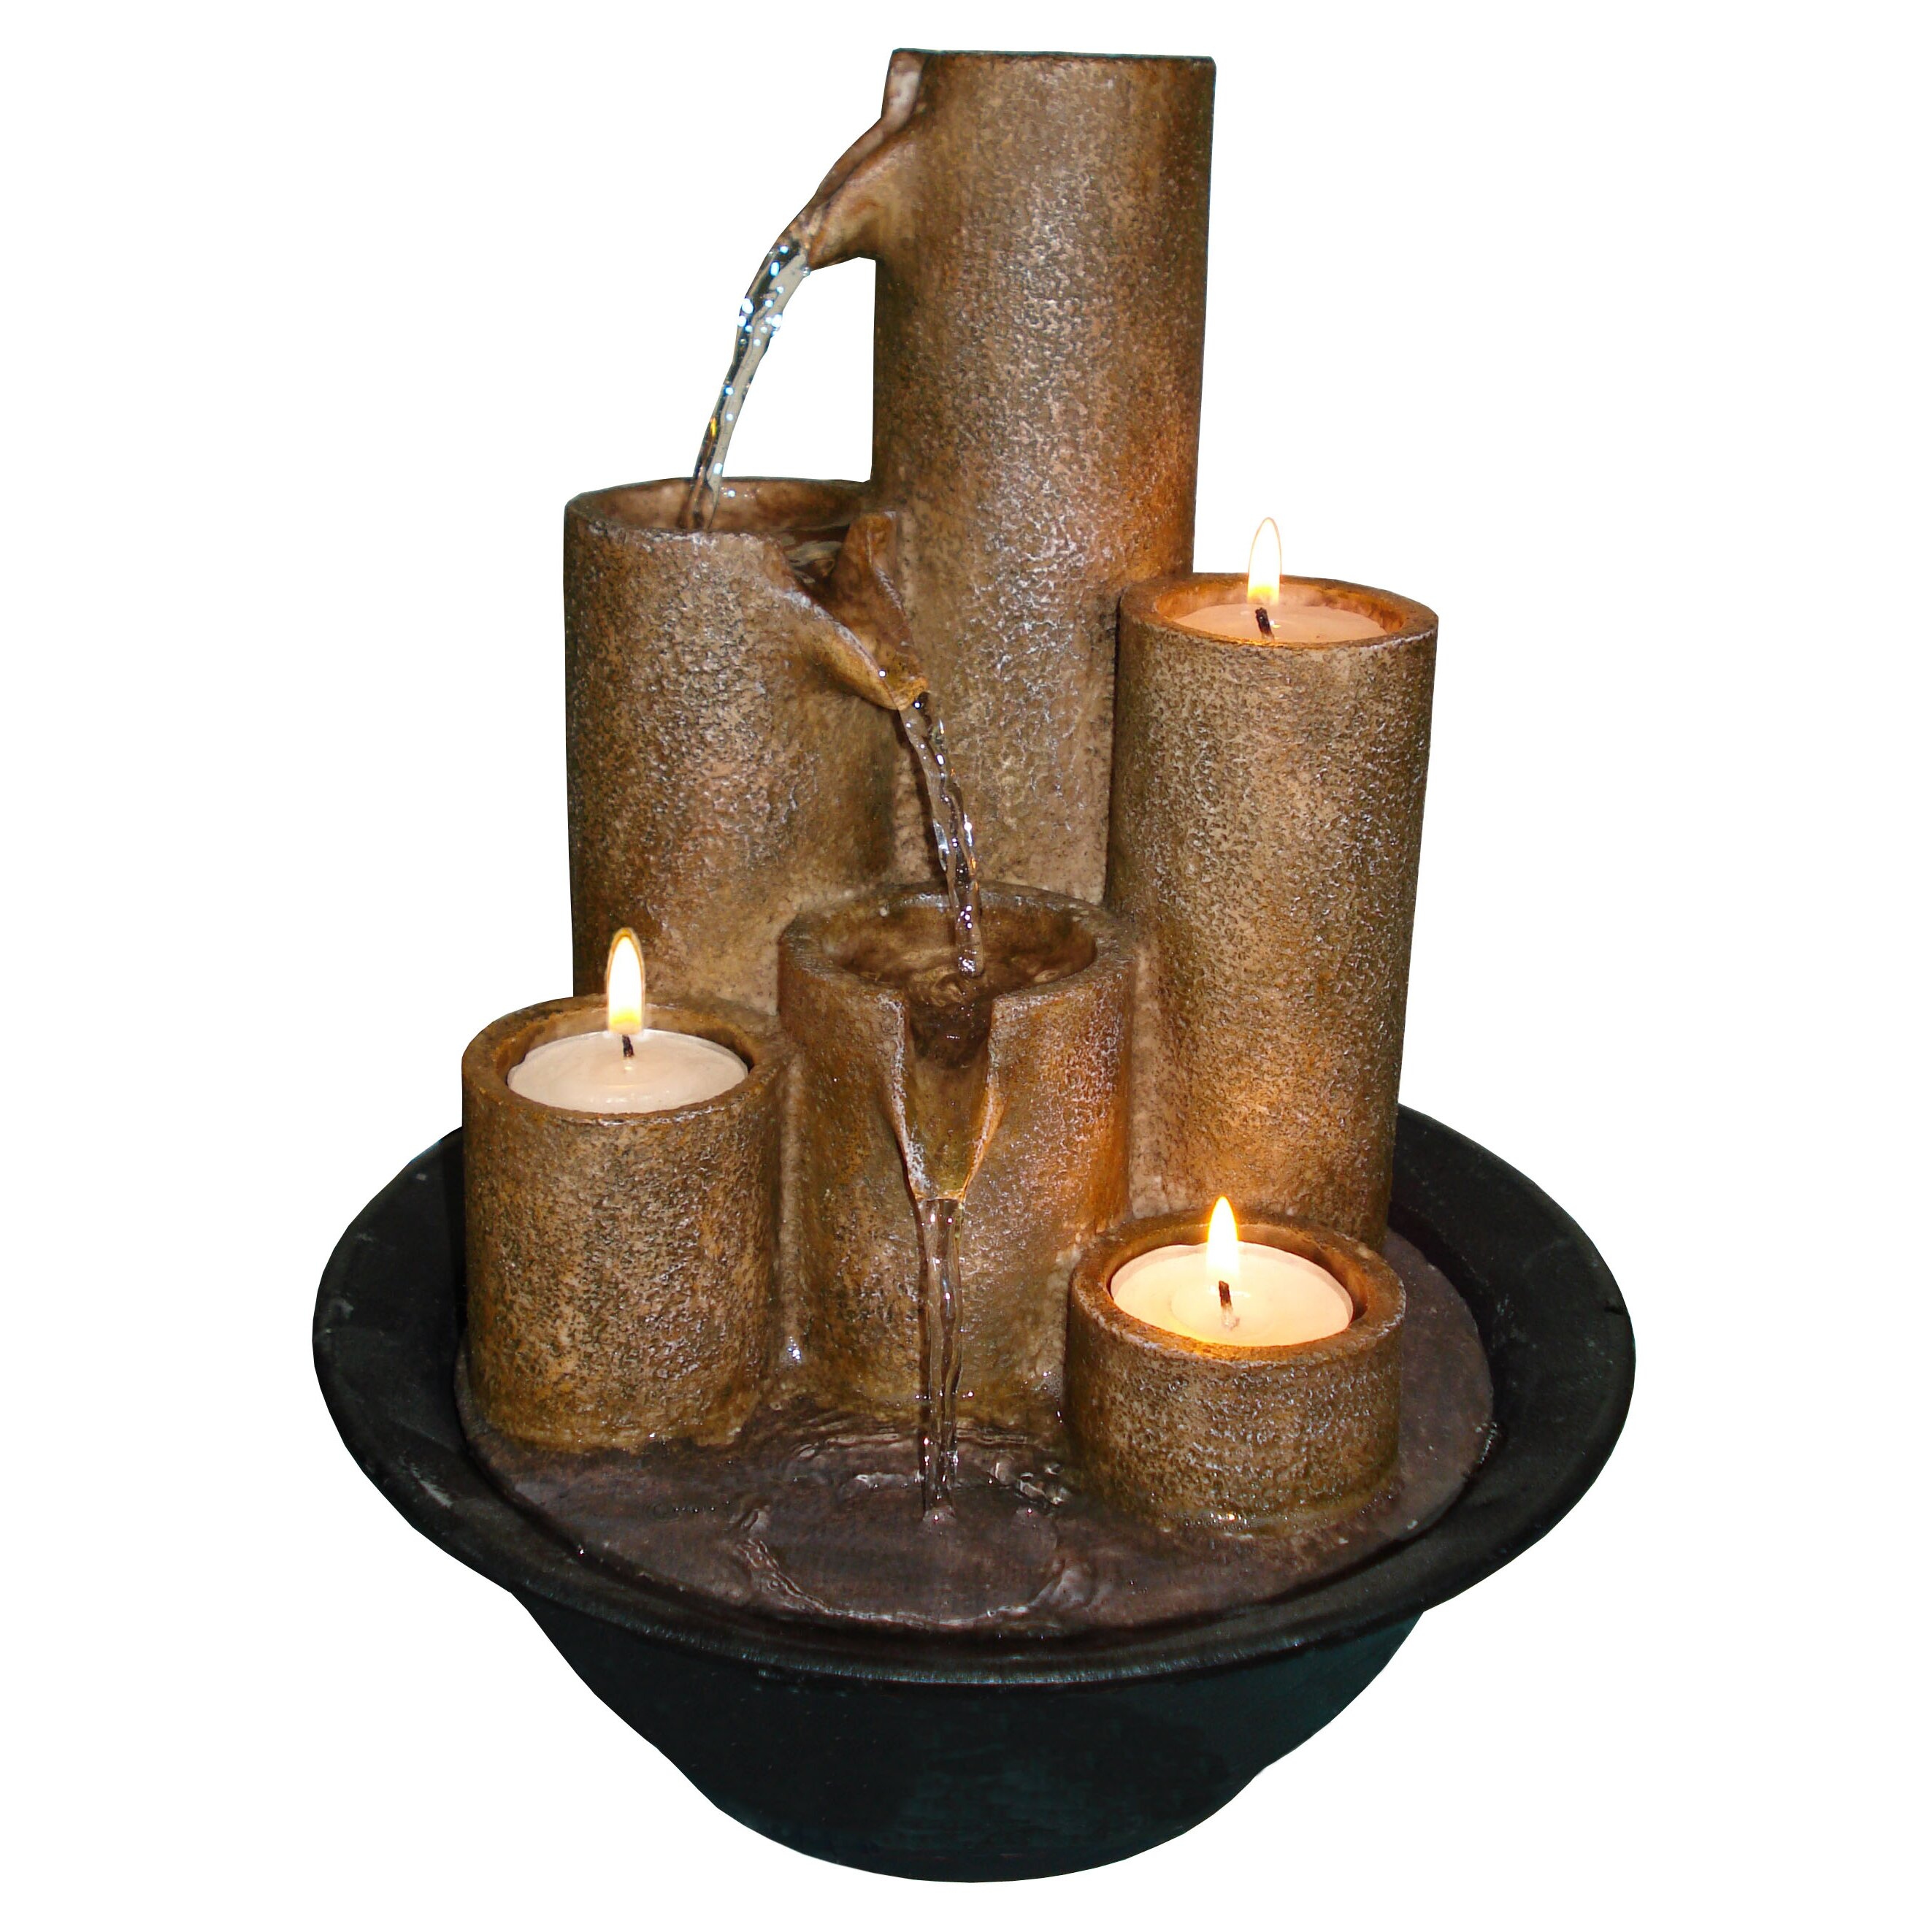 Water fountains calgary - Eternity Fiberglass 3 Candle Fountain